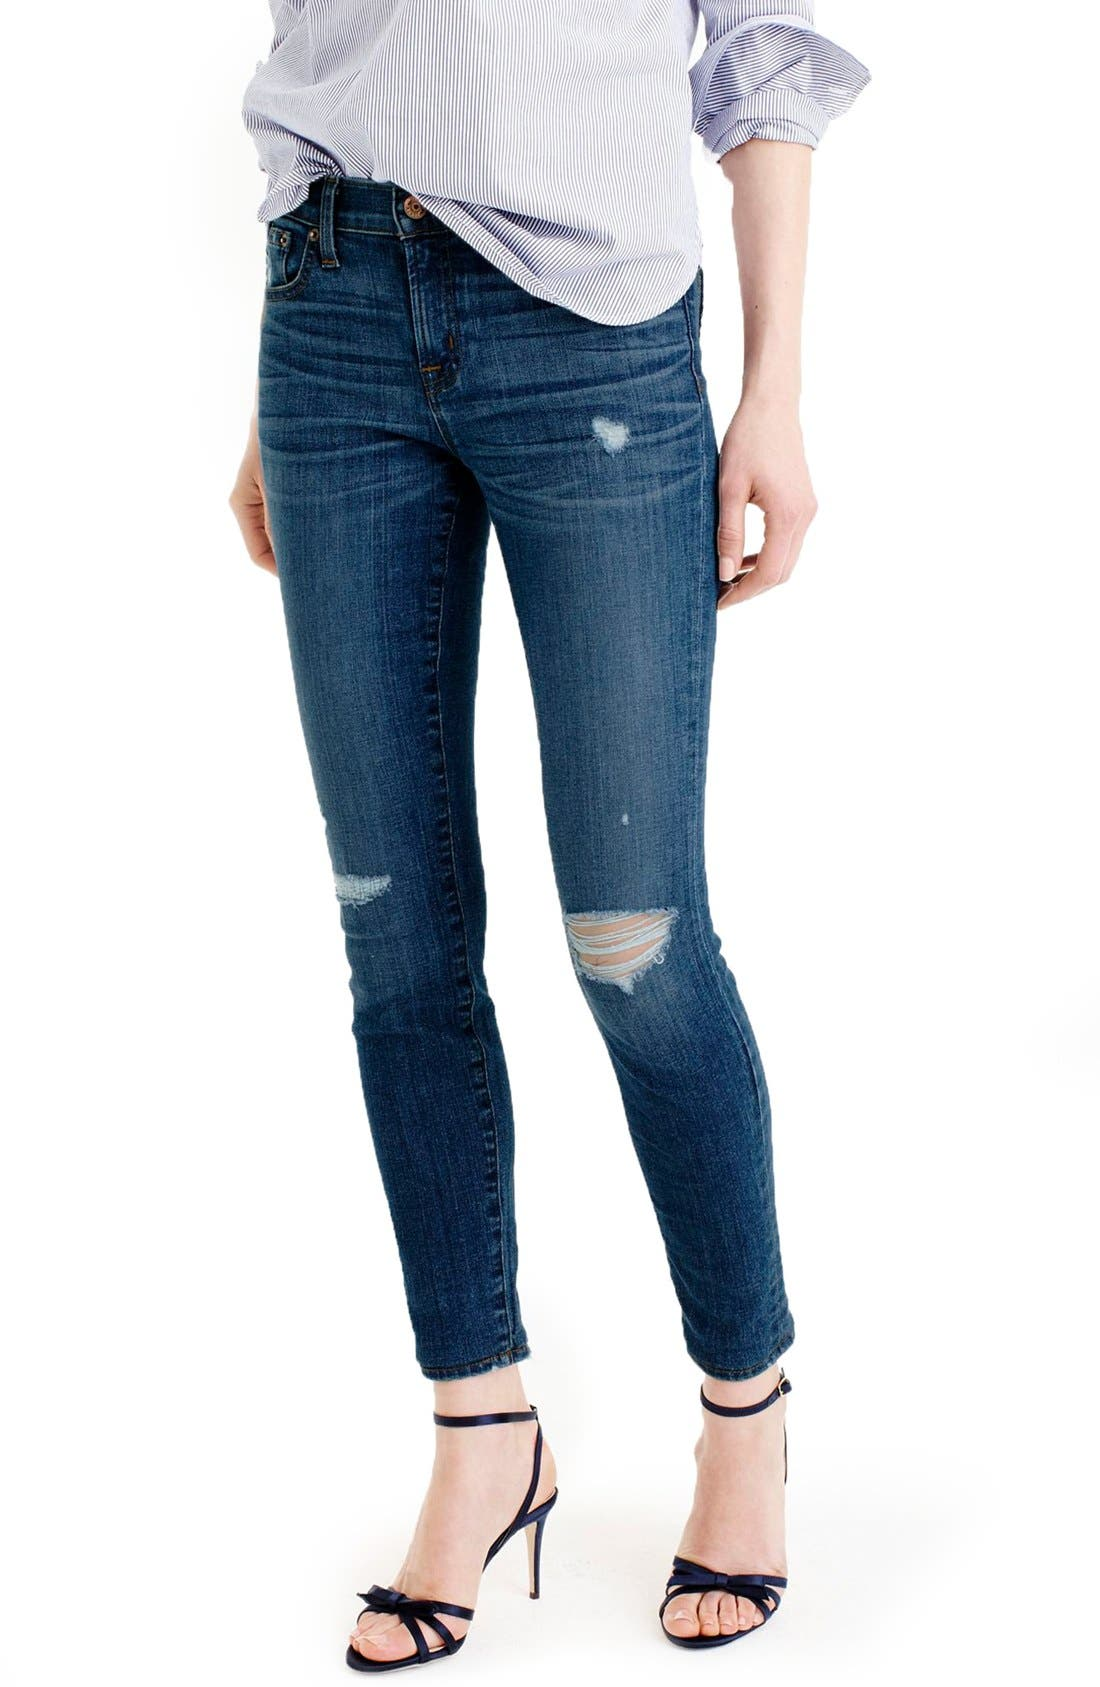 Main Image - J.Crew Toothpick Jeans (Pamona) (Regular & Petite)